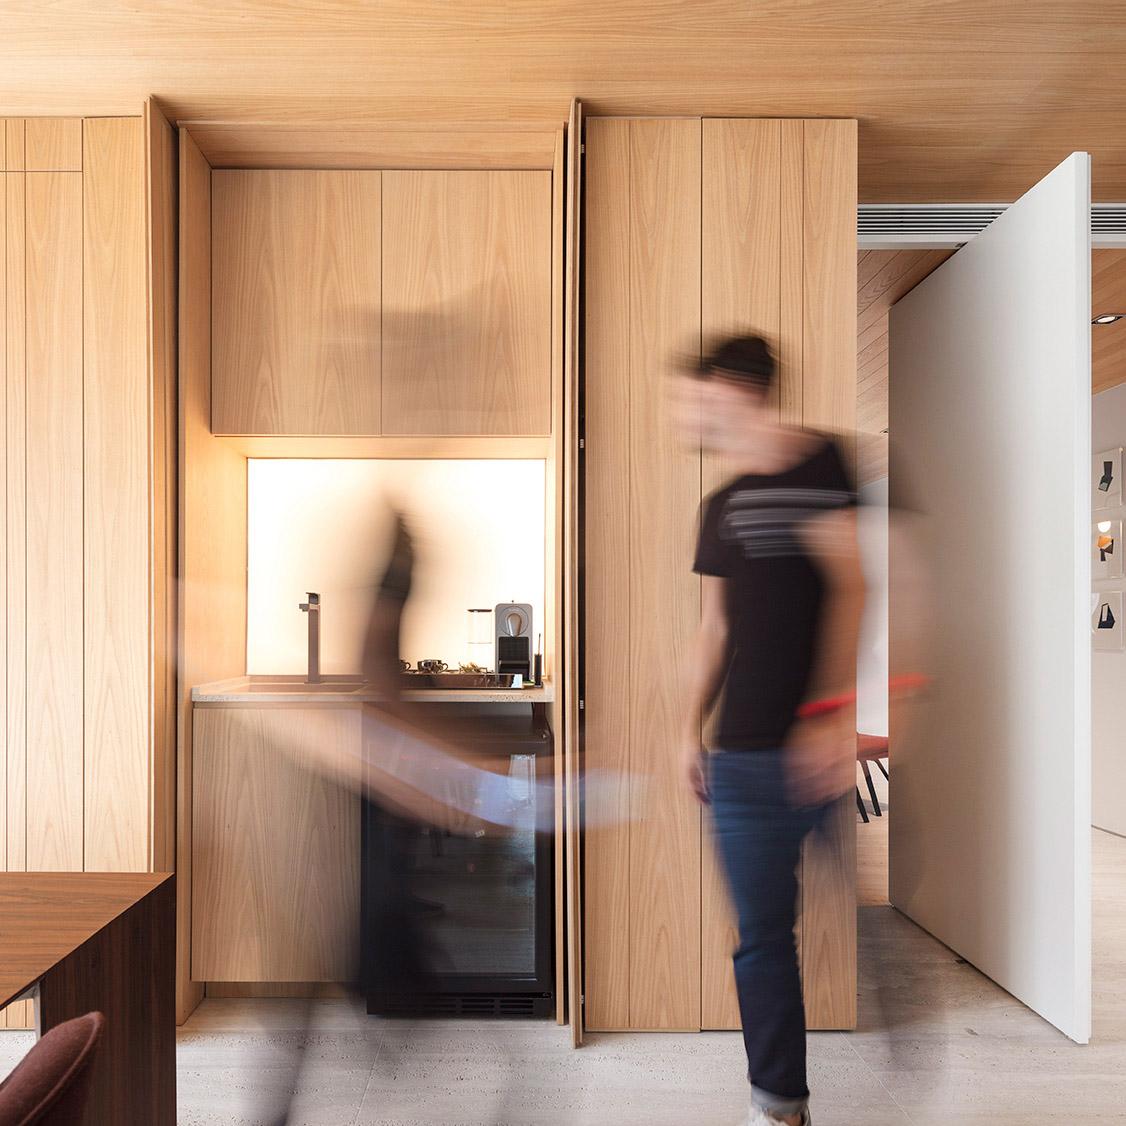 projeto eretz-fernanda marques arquiteta 9.jpg